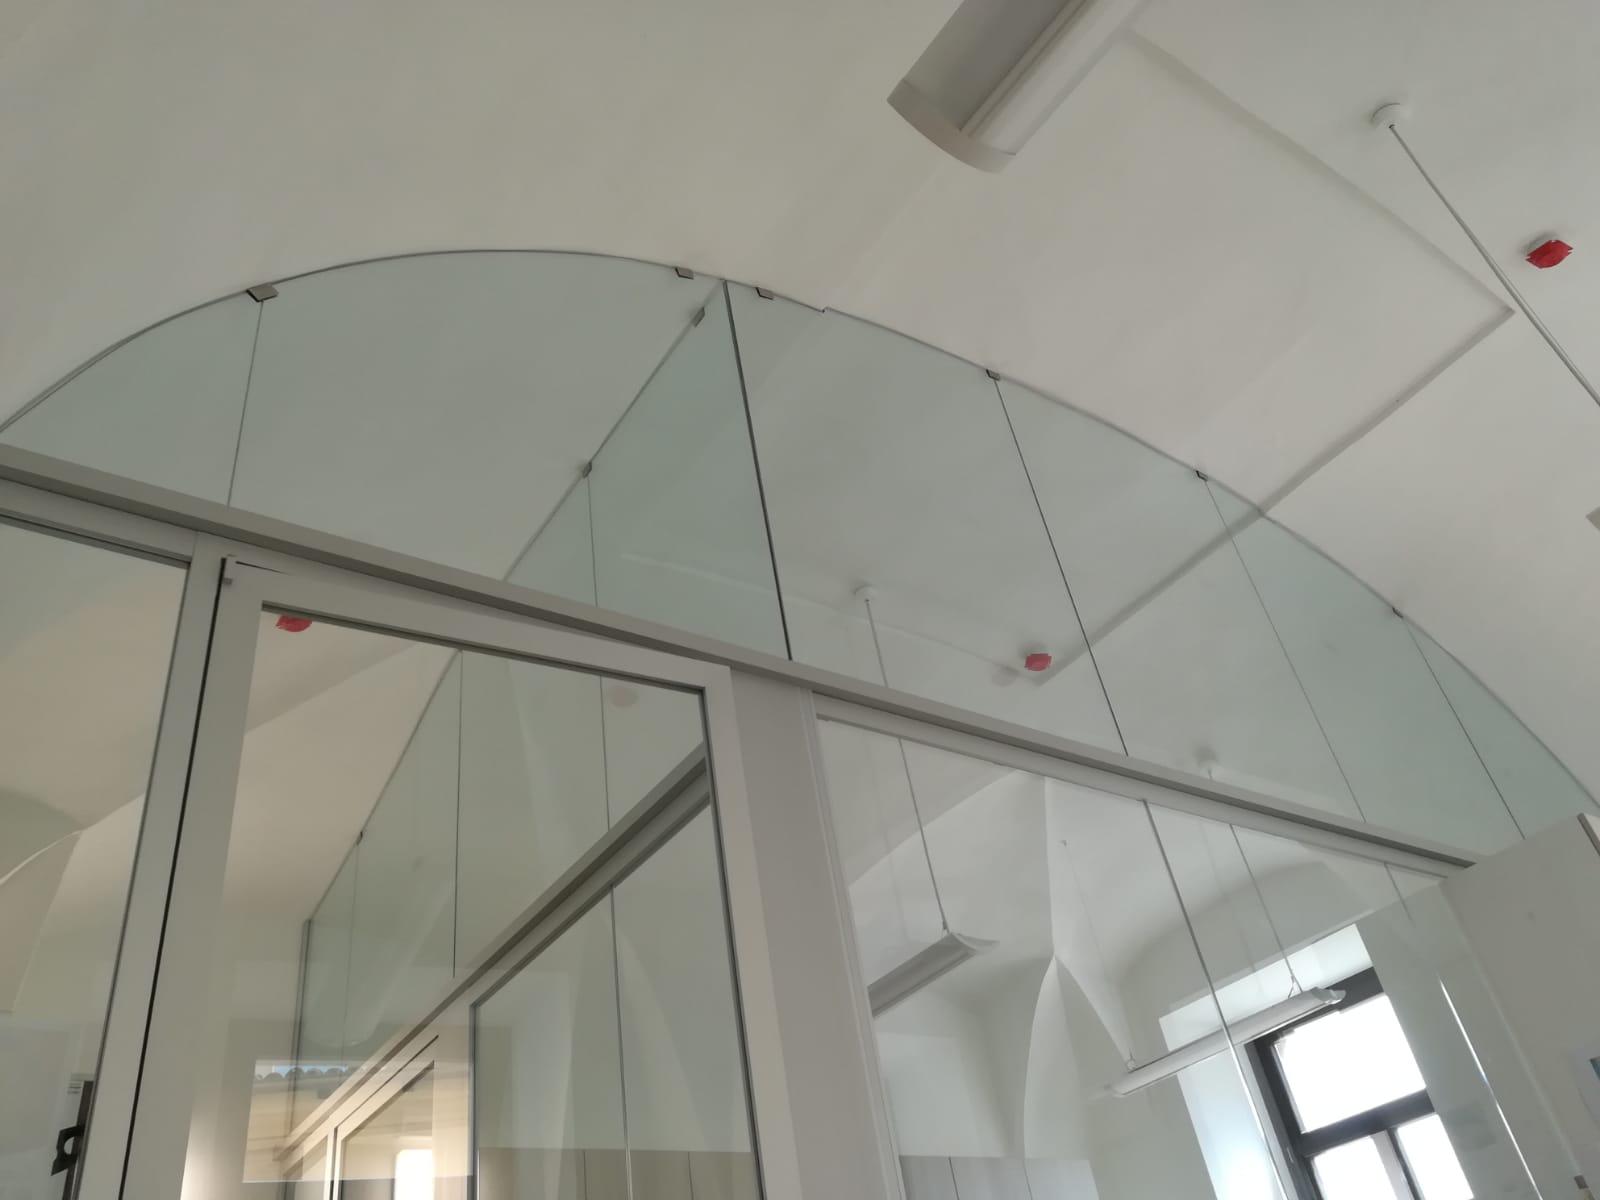 vetreria gottardi, parete divisoria, divisoria, vetro, gottardi pergine, vetreria, vetro, pergine, trento, divisoria uffici